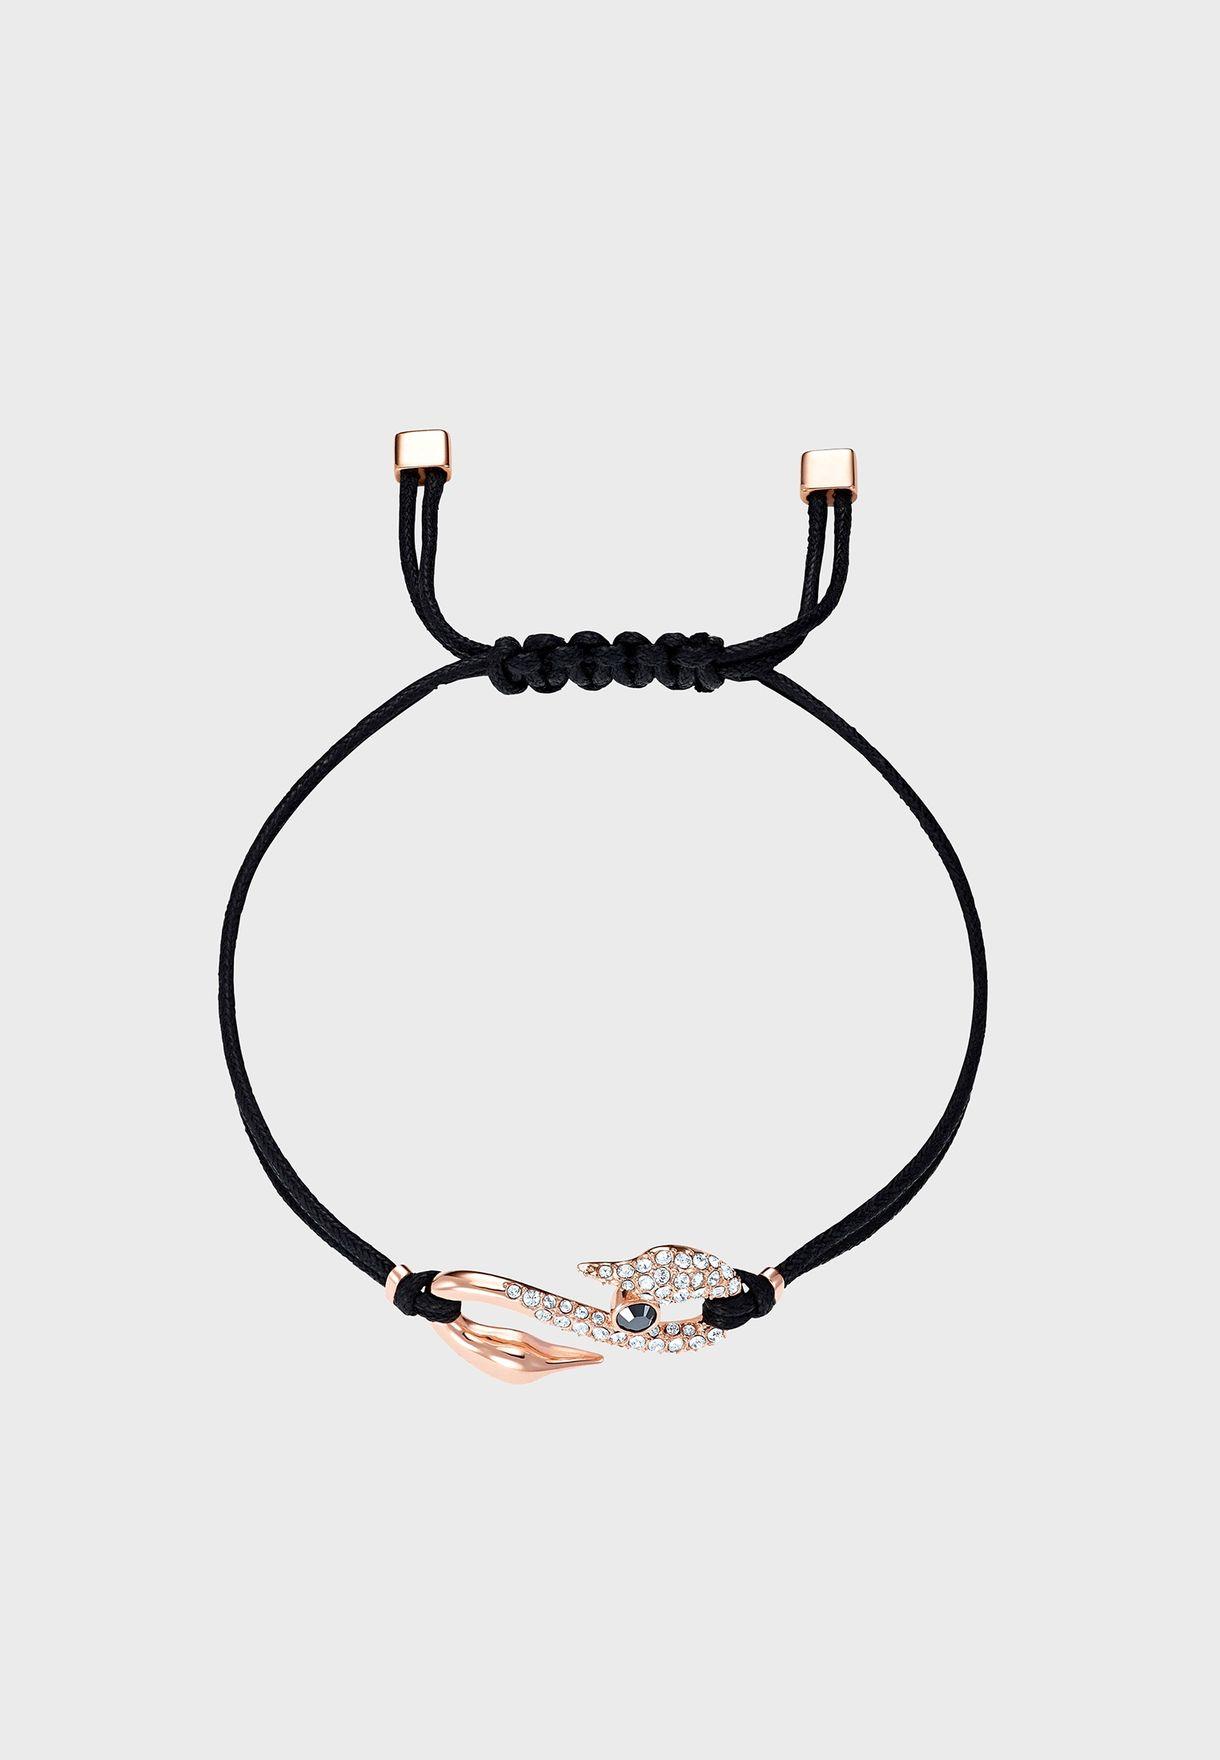 Swapower S Hook Jet/Cry Bracelet